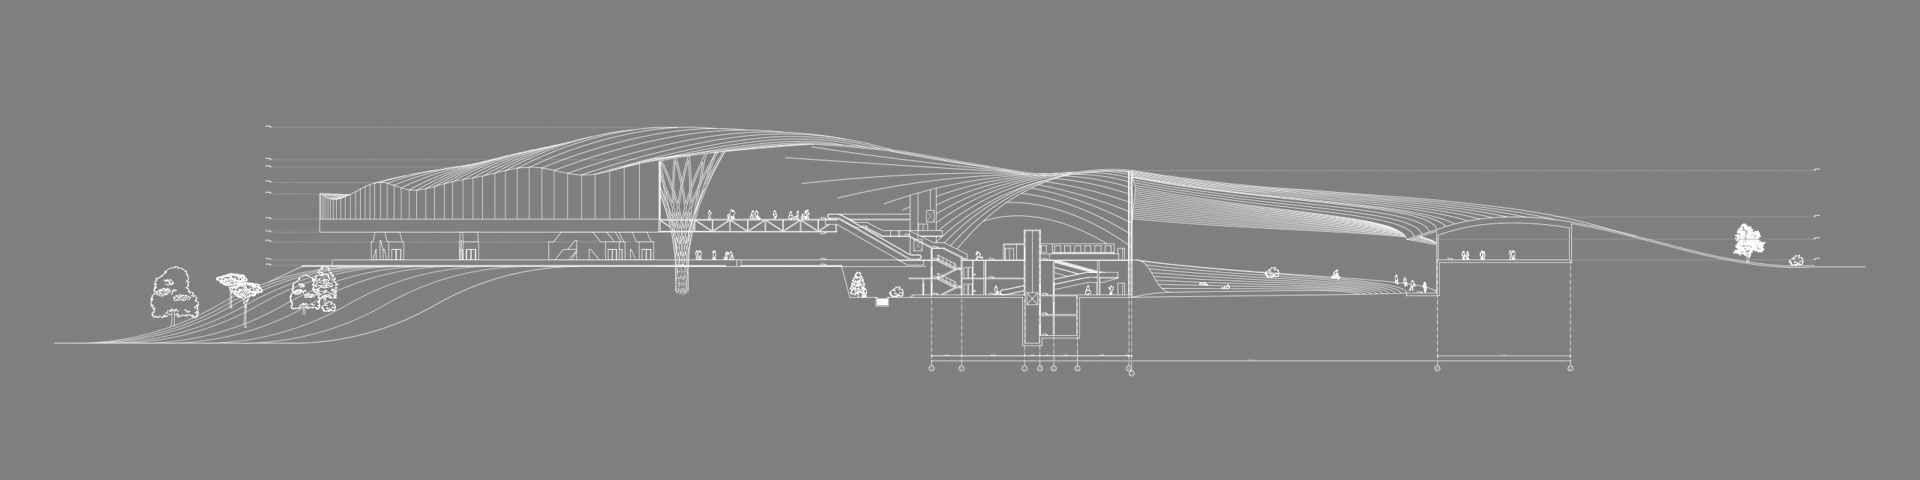 архитектура вокзала - разрез транспортного узла